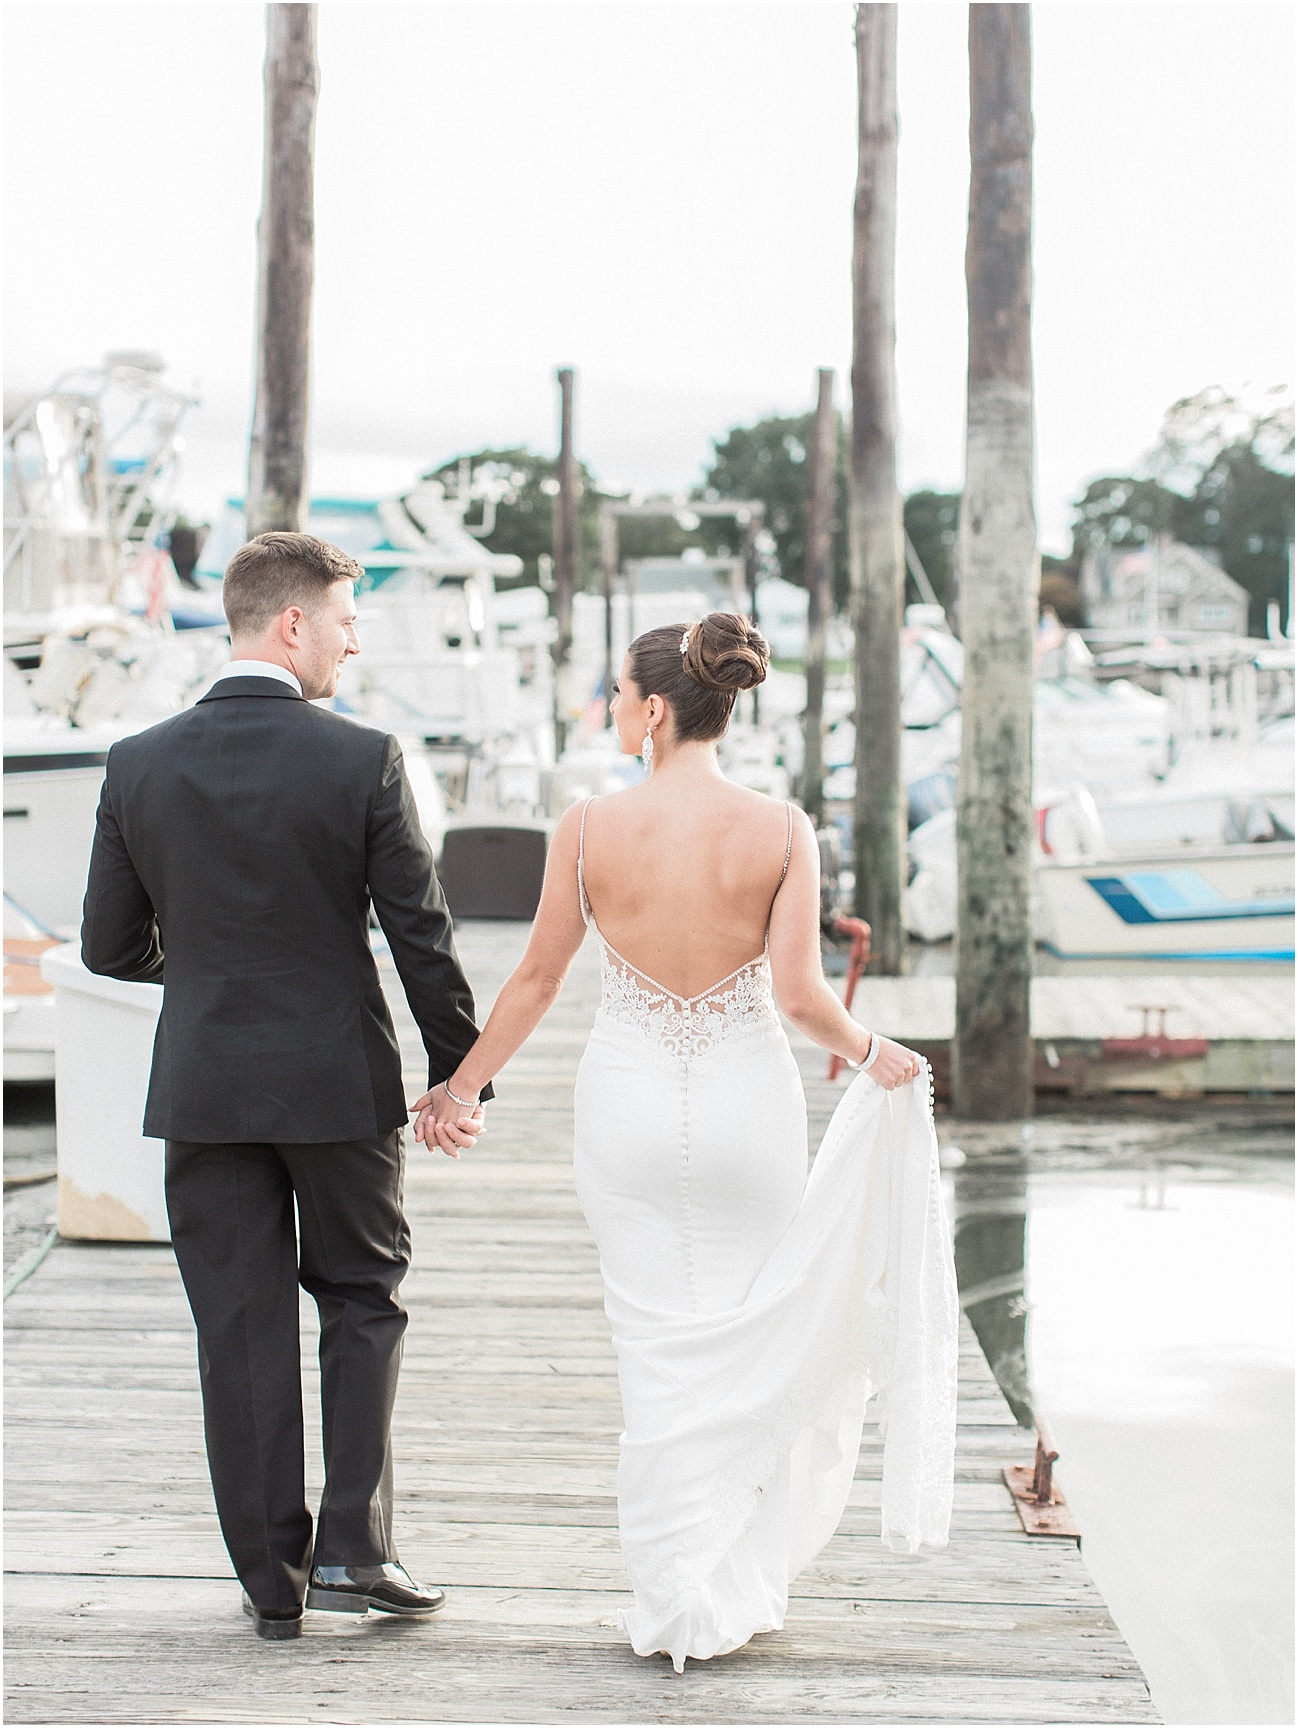 bianca_chris_danversport_italian_blush_gold_north_shore_cape_cod_boston_wedding_photographer_meredith_jane_photography_photo_1142.jpg